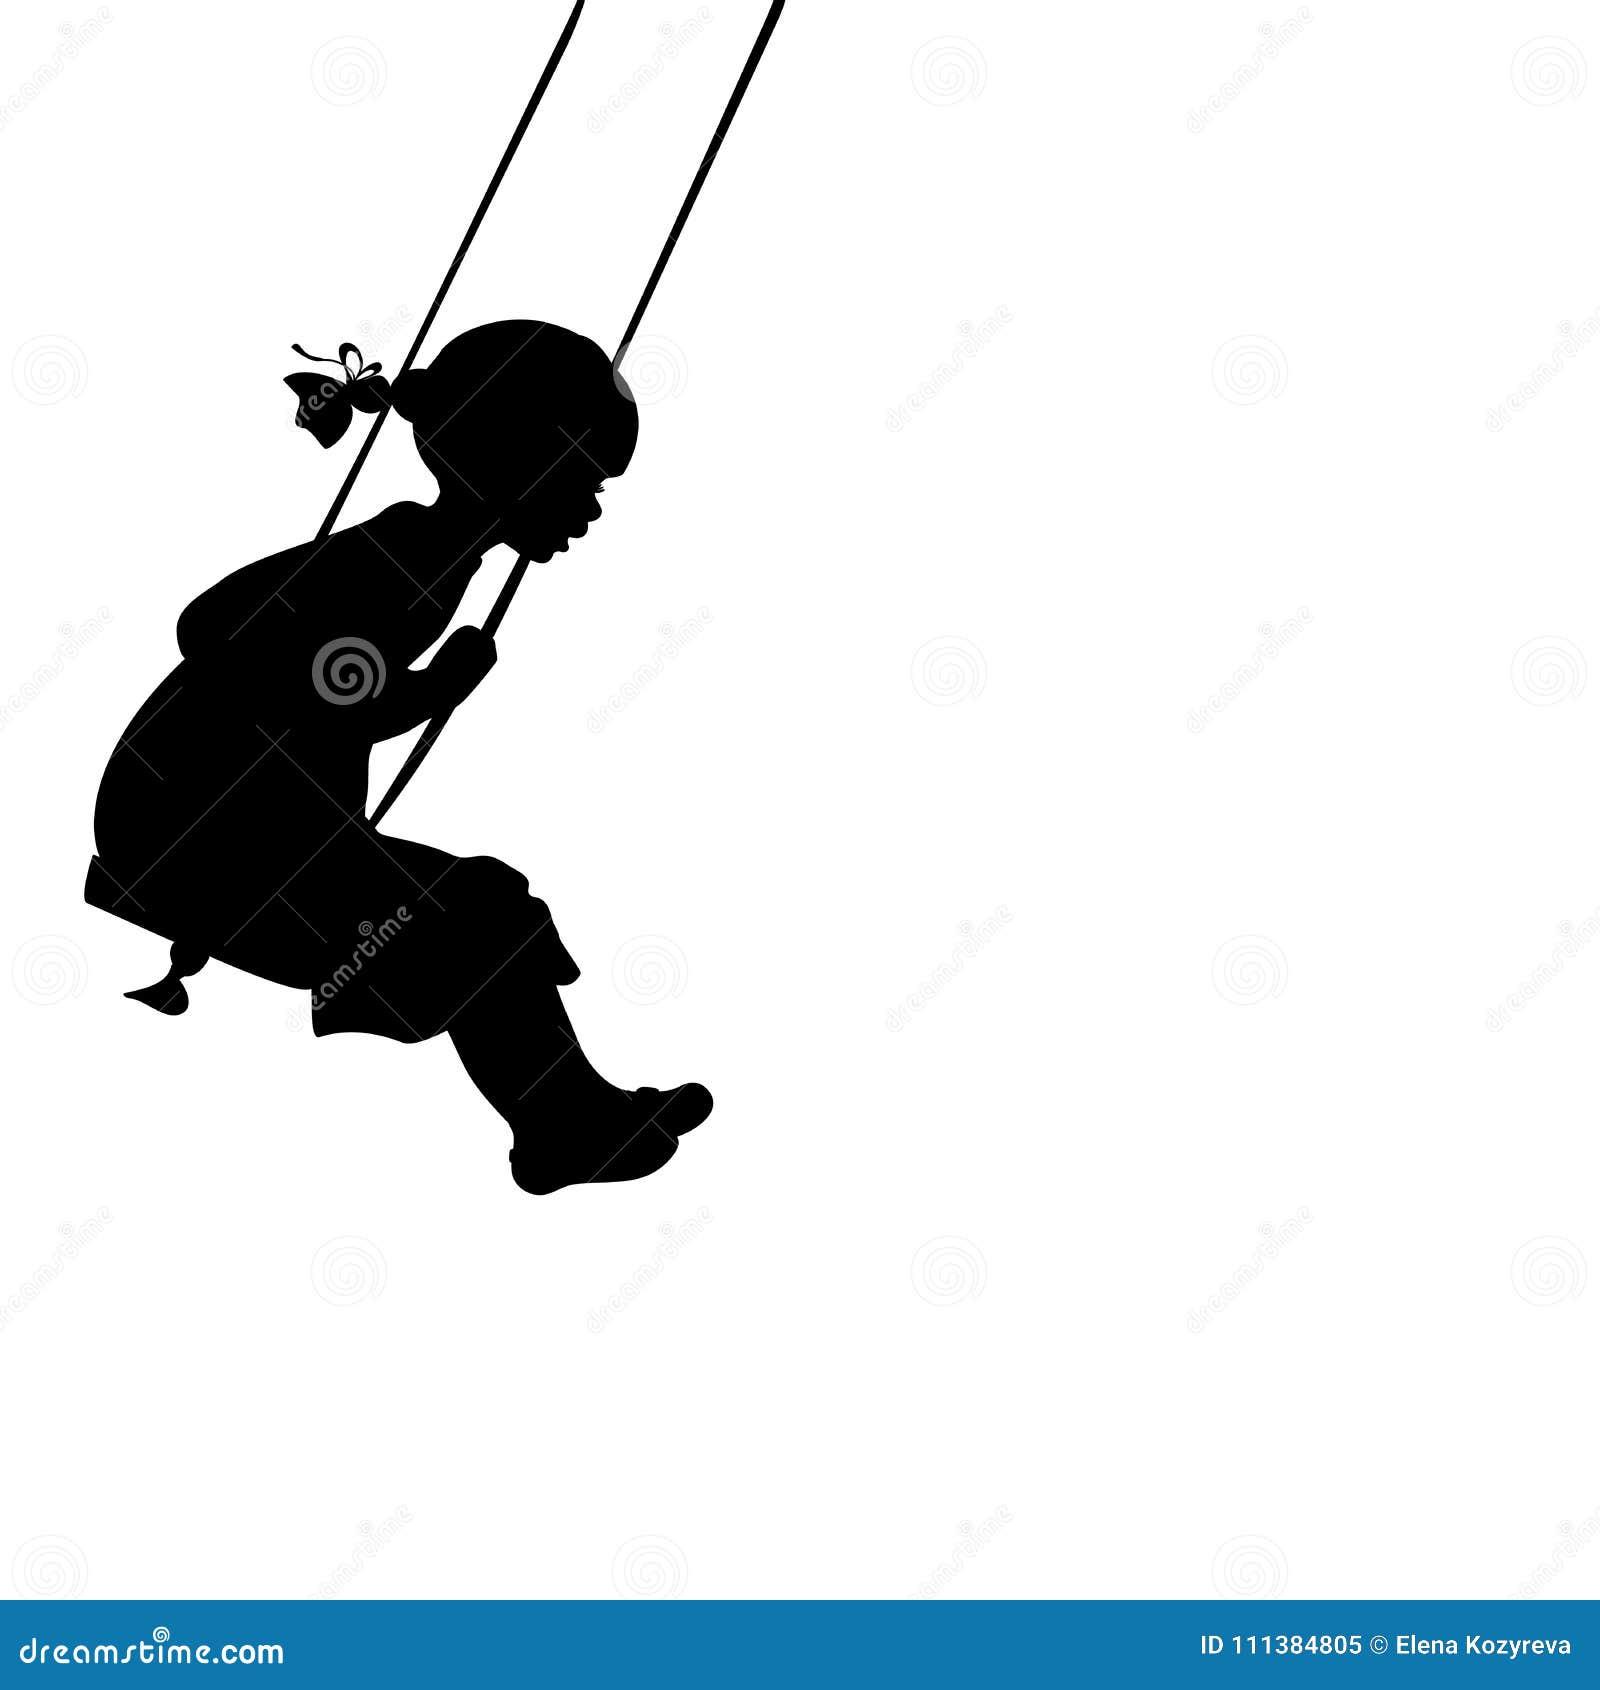 swinging cartoons  illustrations  u0026 vector stock images